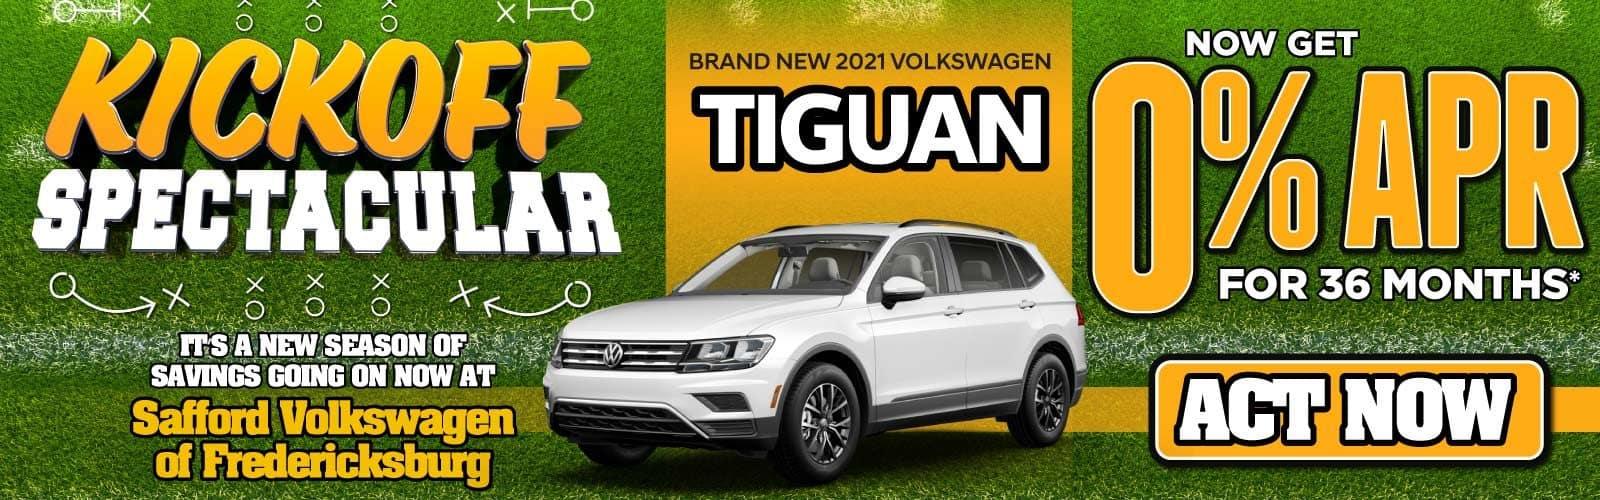 New 2021 Volkswagen Tiguan 0% APR for 36 Months — ACT NOW